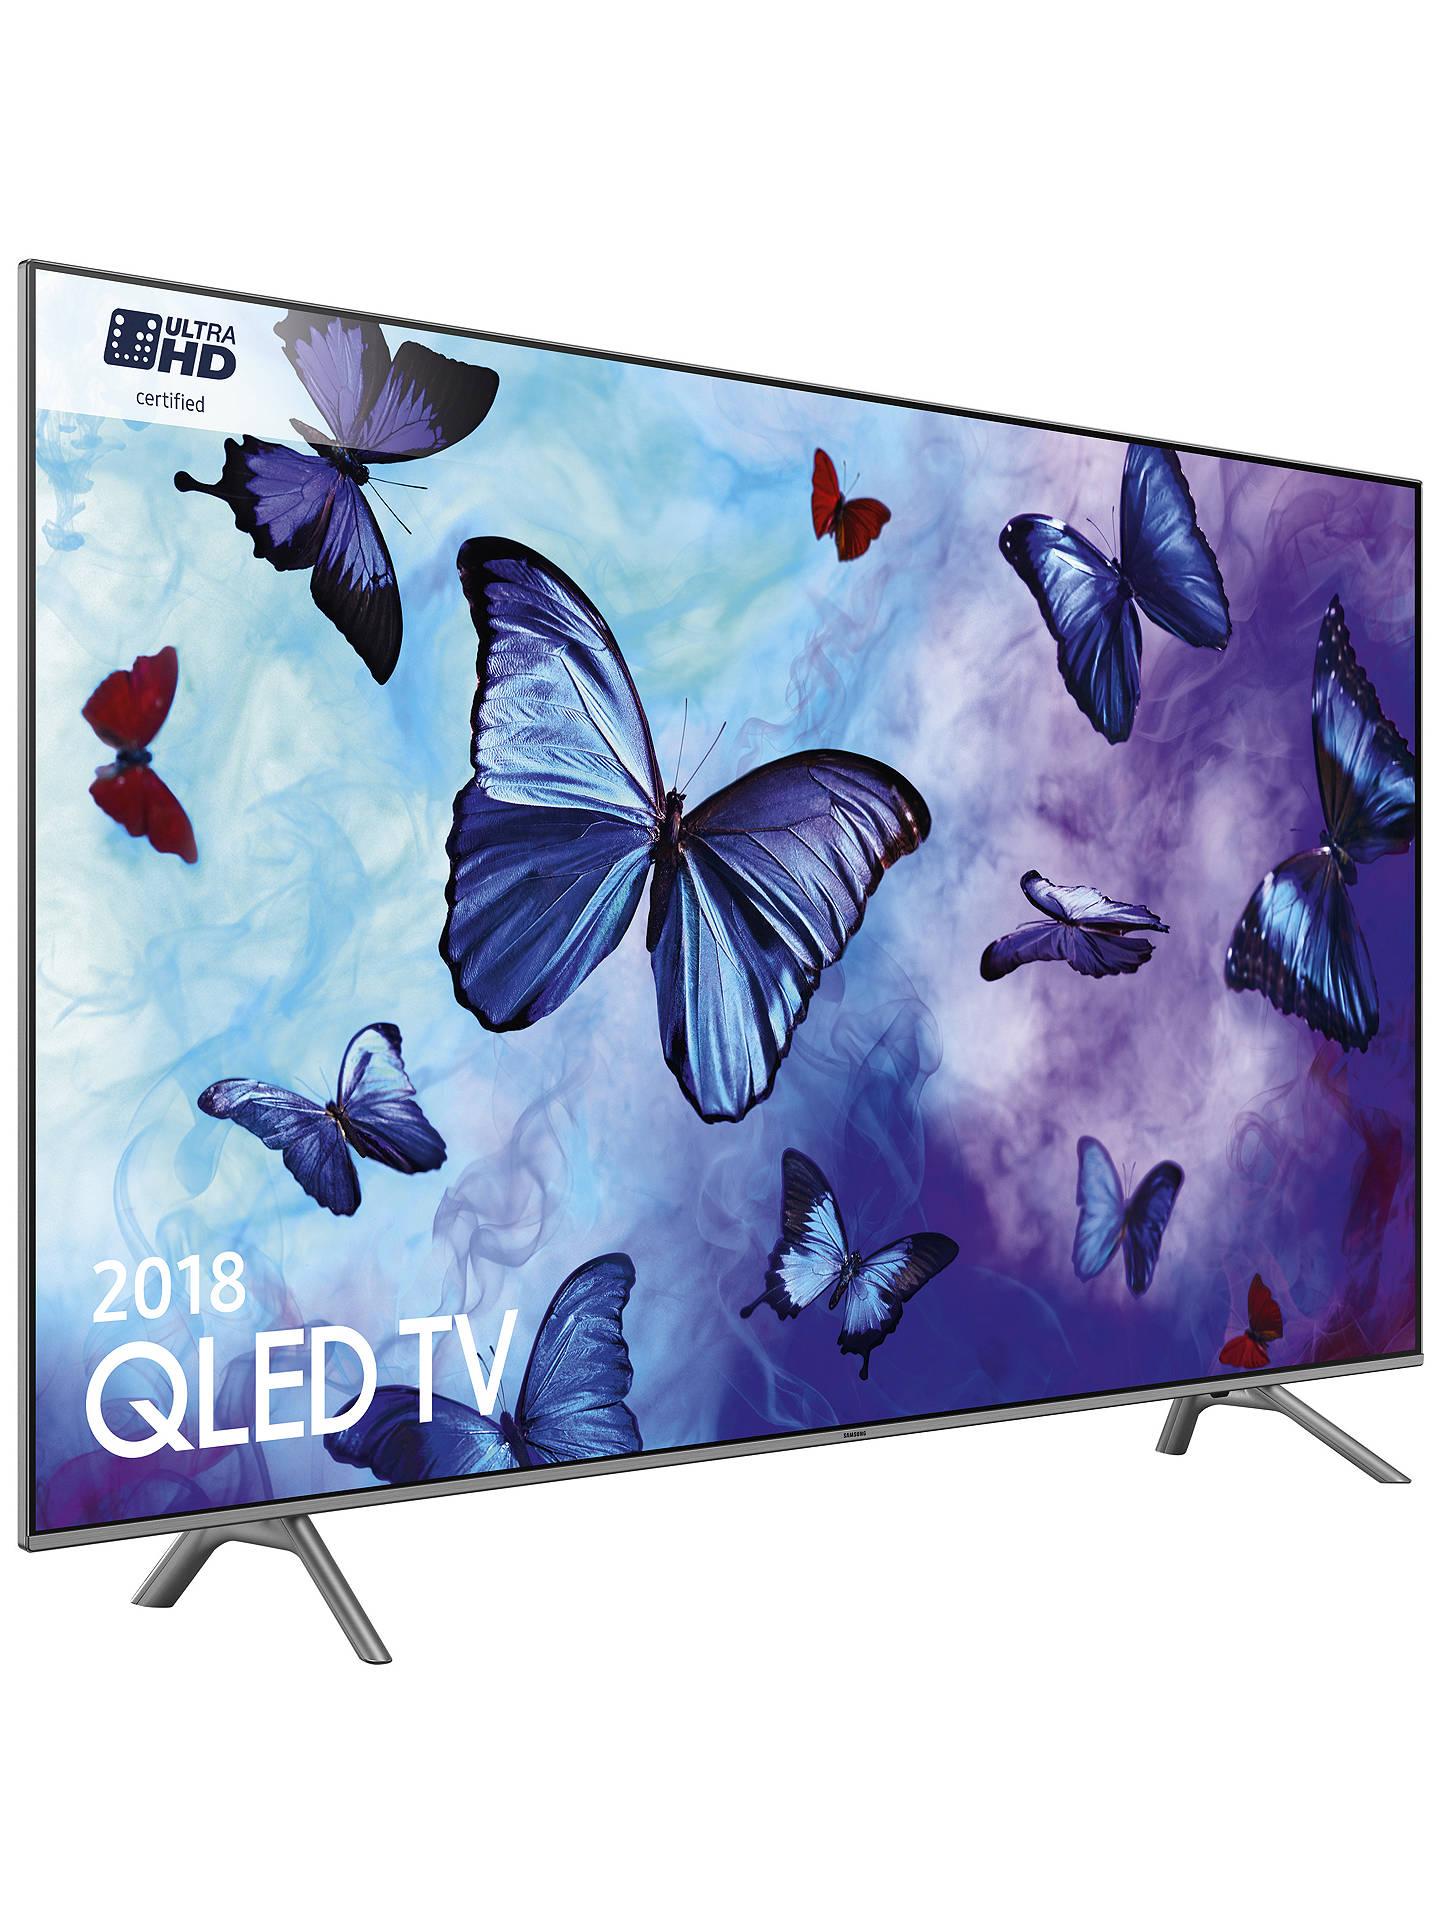 Samsung 55inch QLED TV QE55Q6FNAT 2018 model, Ultra HD, HDR10+ £699 @ districtelectricals